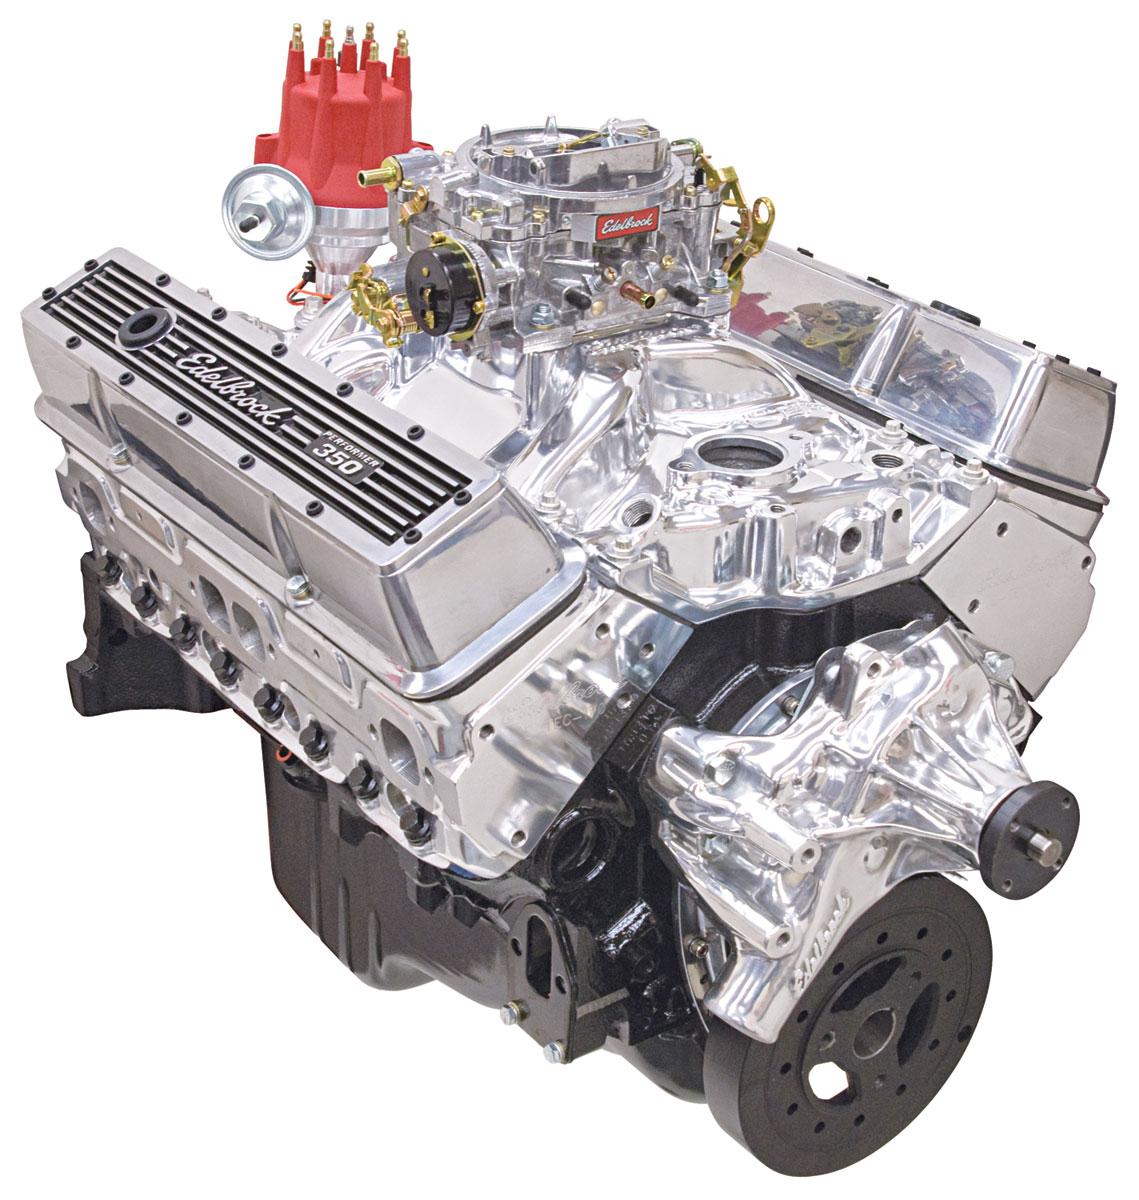 Photo of Crate Engine, Performer Hi-Torq, Edelbrock Long Water Pump polished